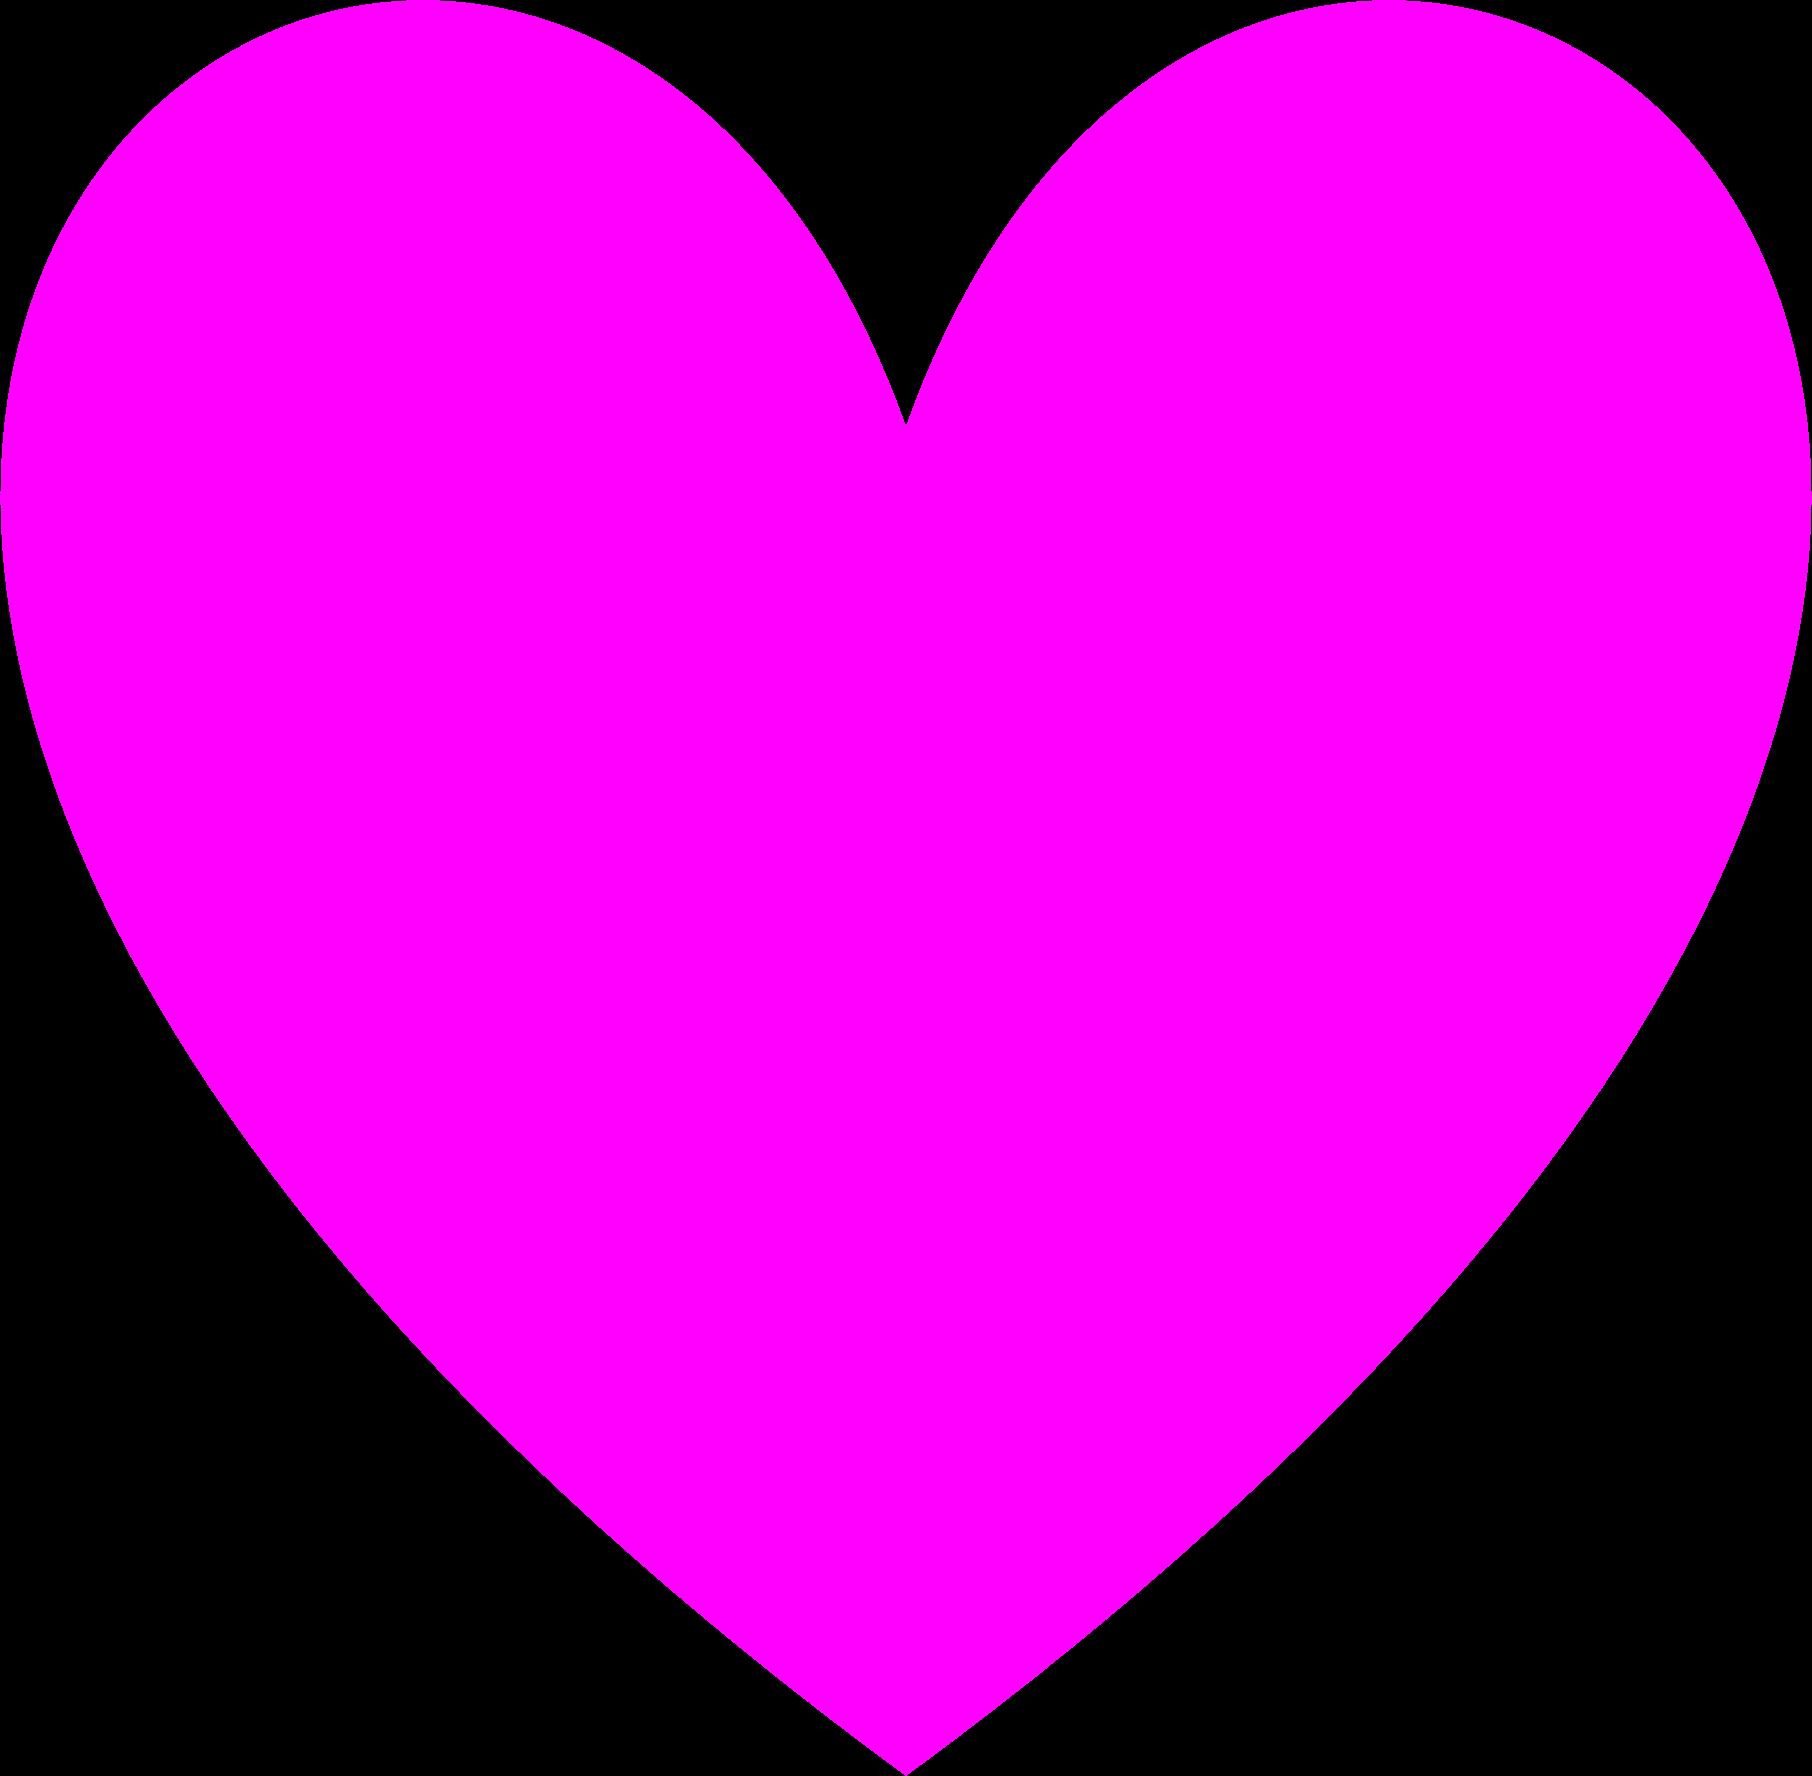 Clipart love heart jpg freeuse Clipart - Transparent Magenta Loveheart jpg freeuse